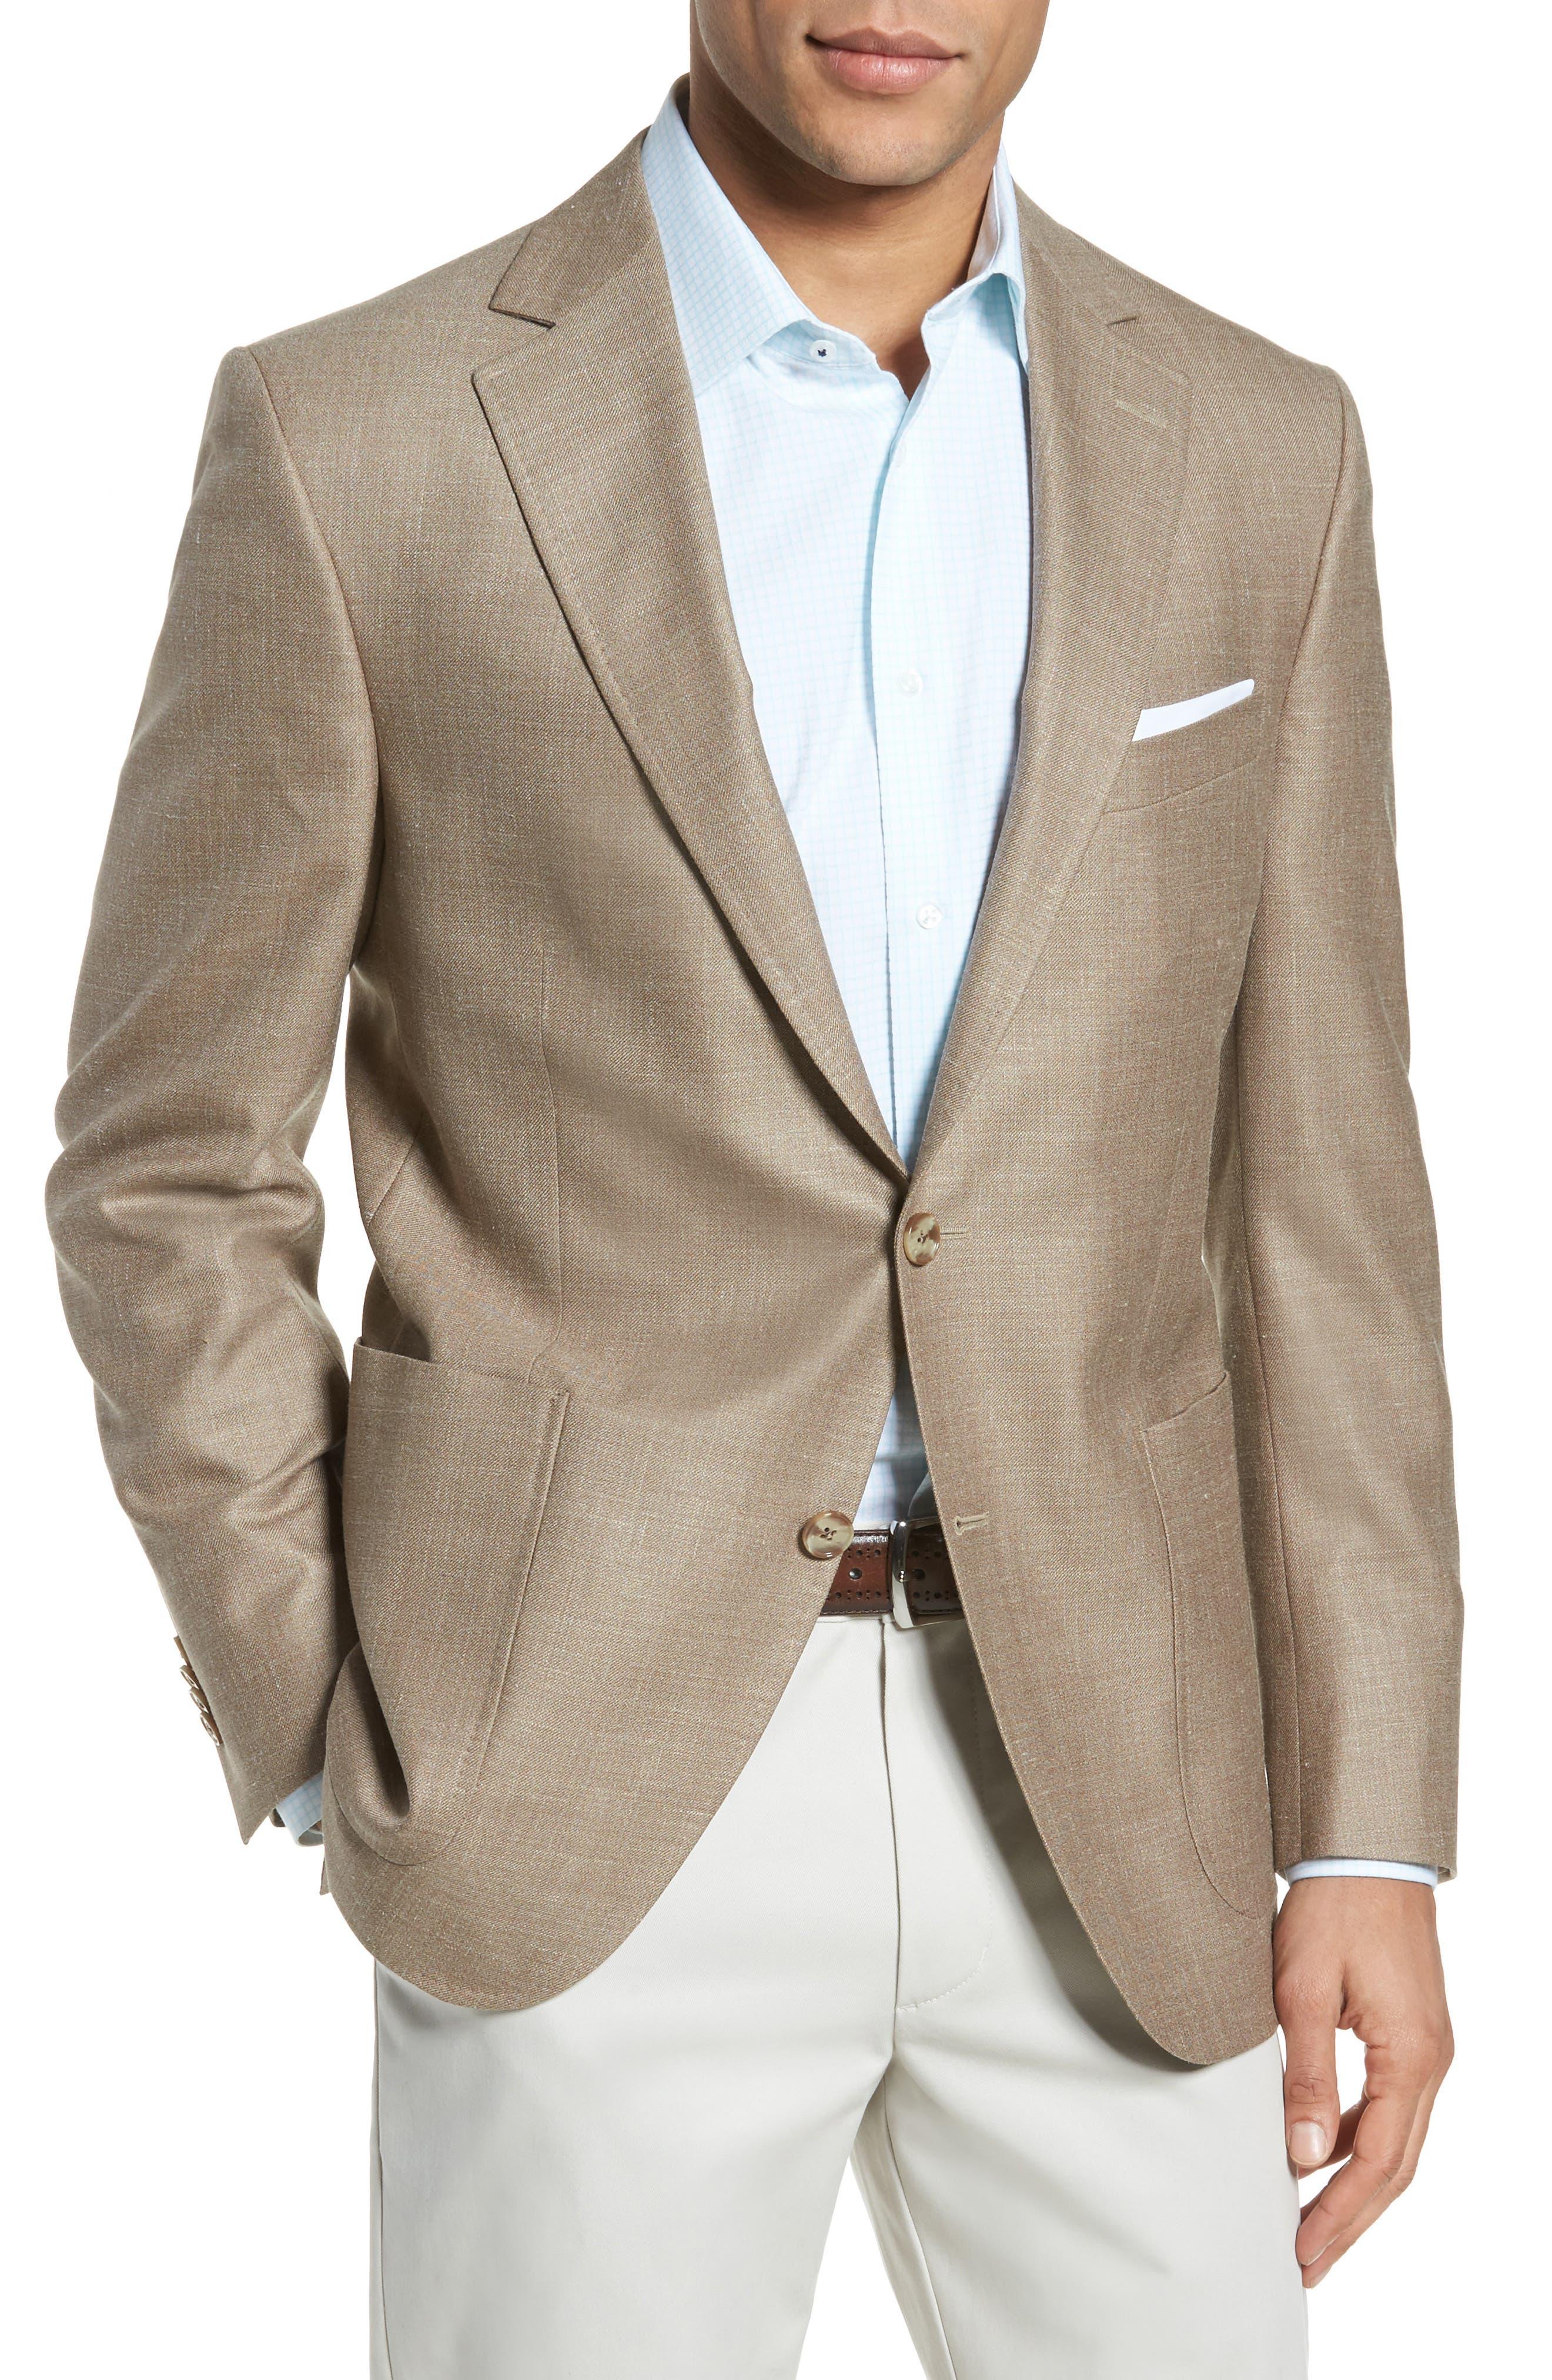 Classic Fit Wool Blend Blazer,                             Main thumbnail 1, color,                             Tan